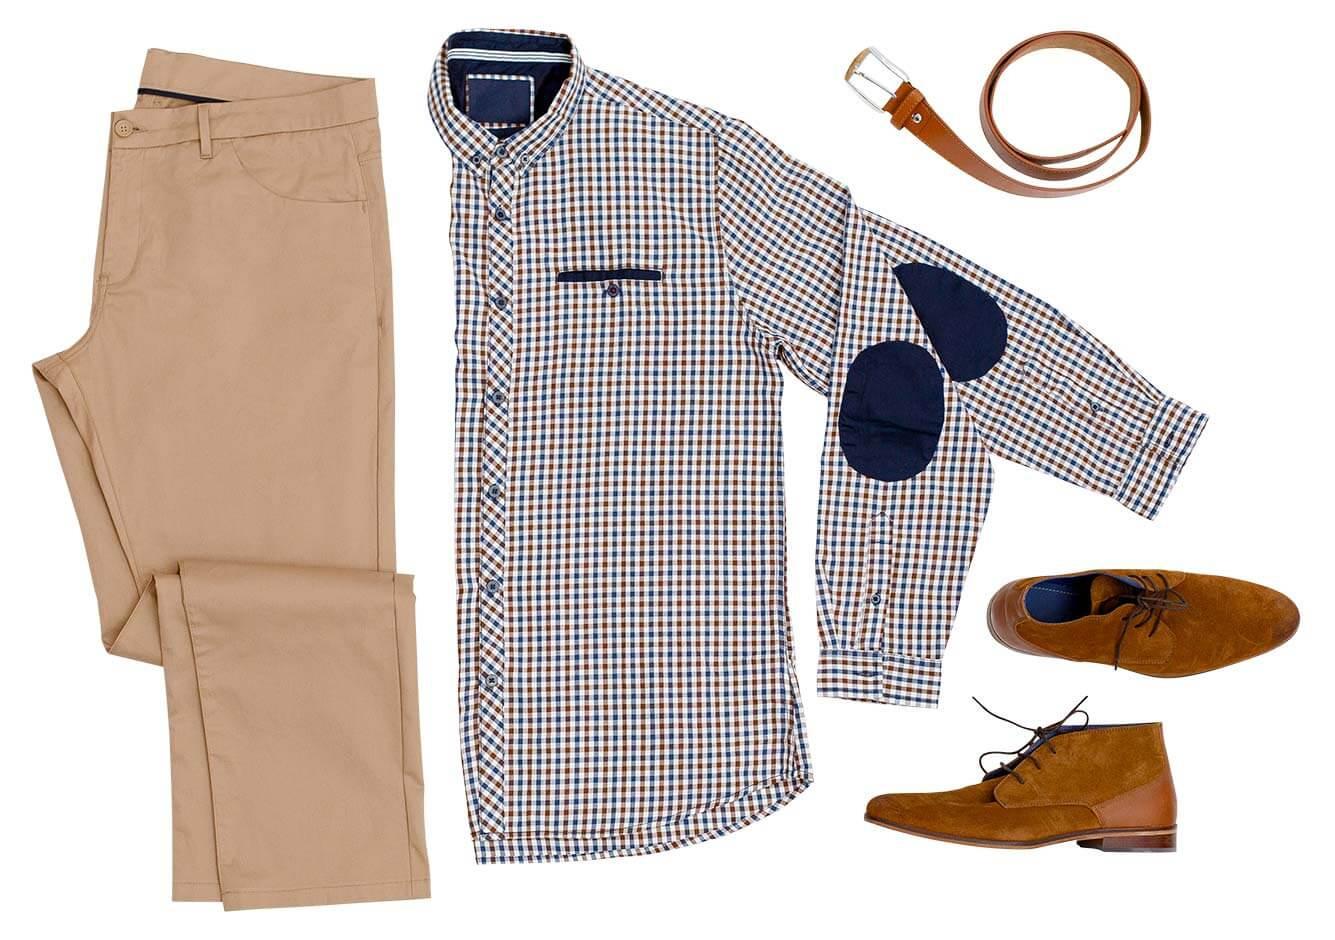 20 Perfekt Kleidung Online Shop Design10 Cool Kleidung Online Shop Galerie